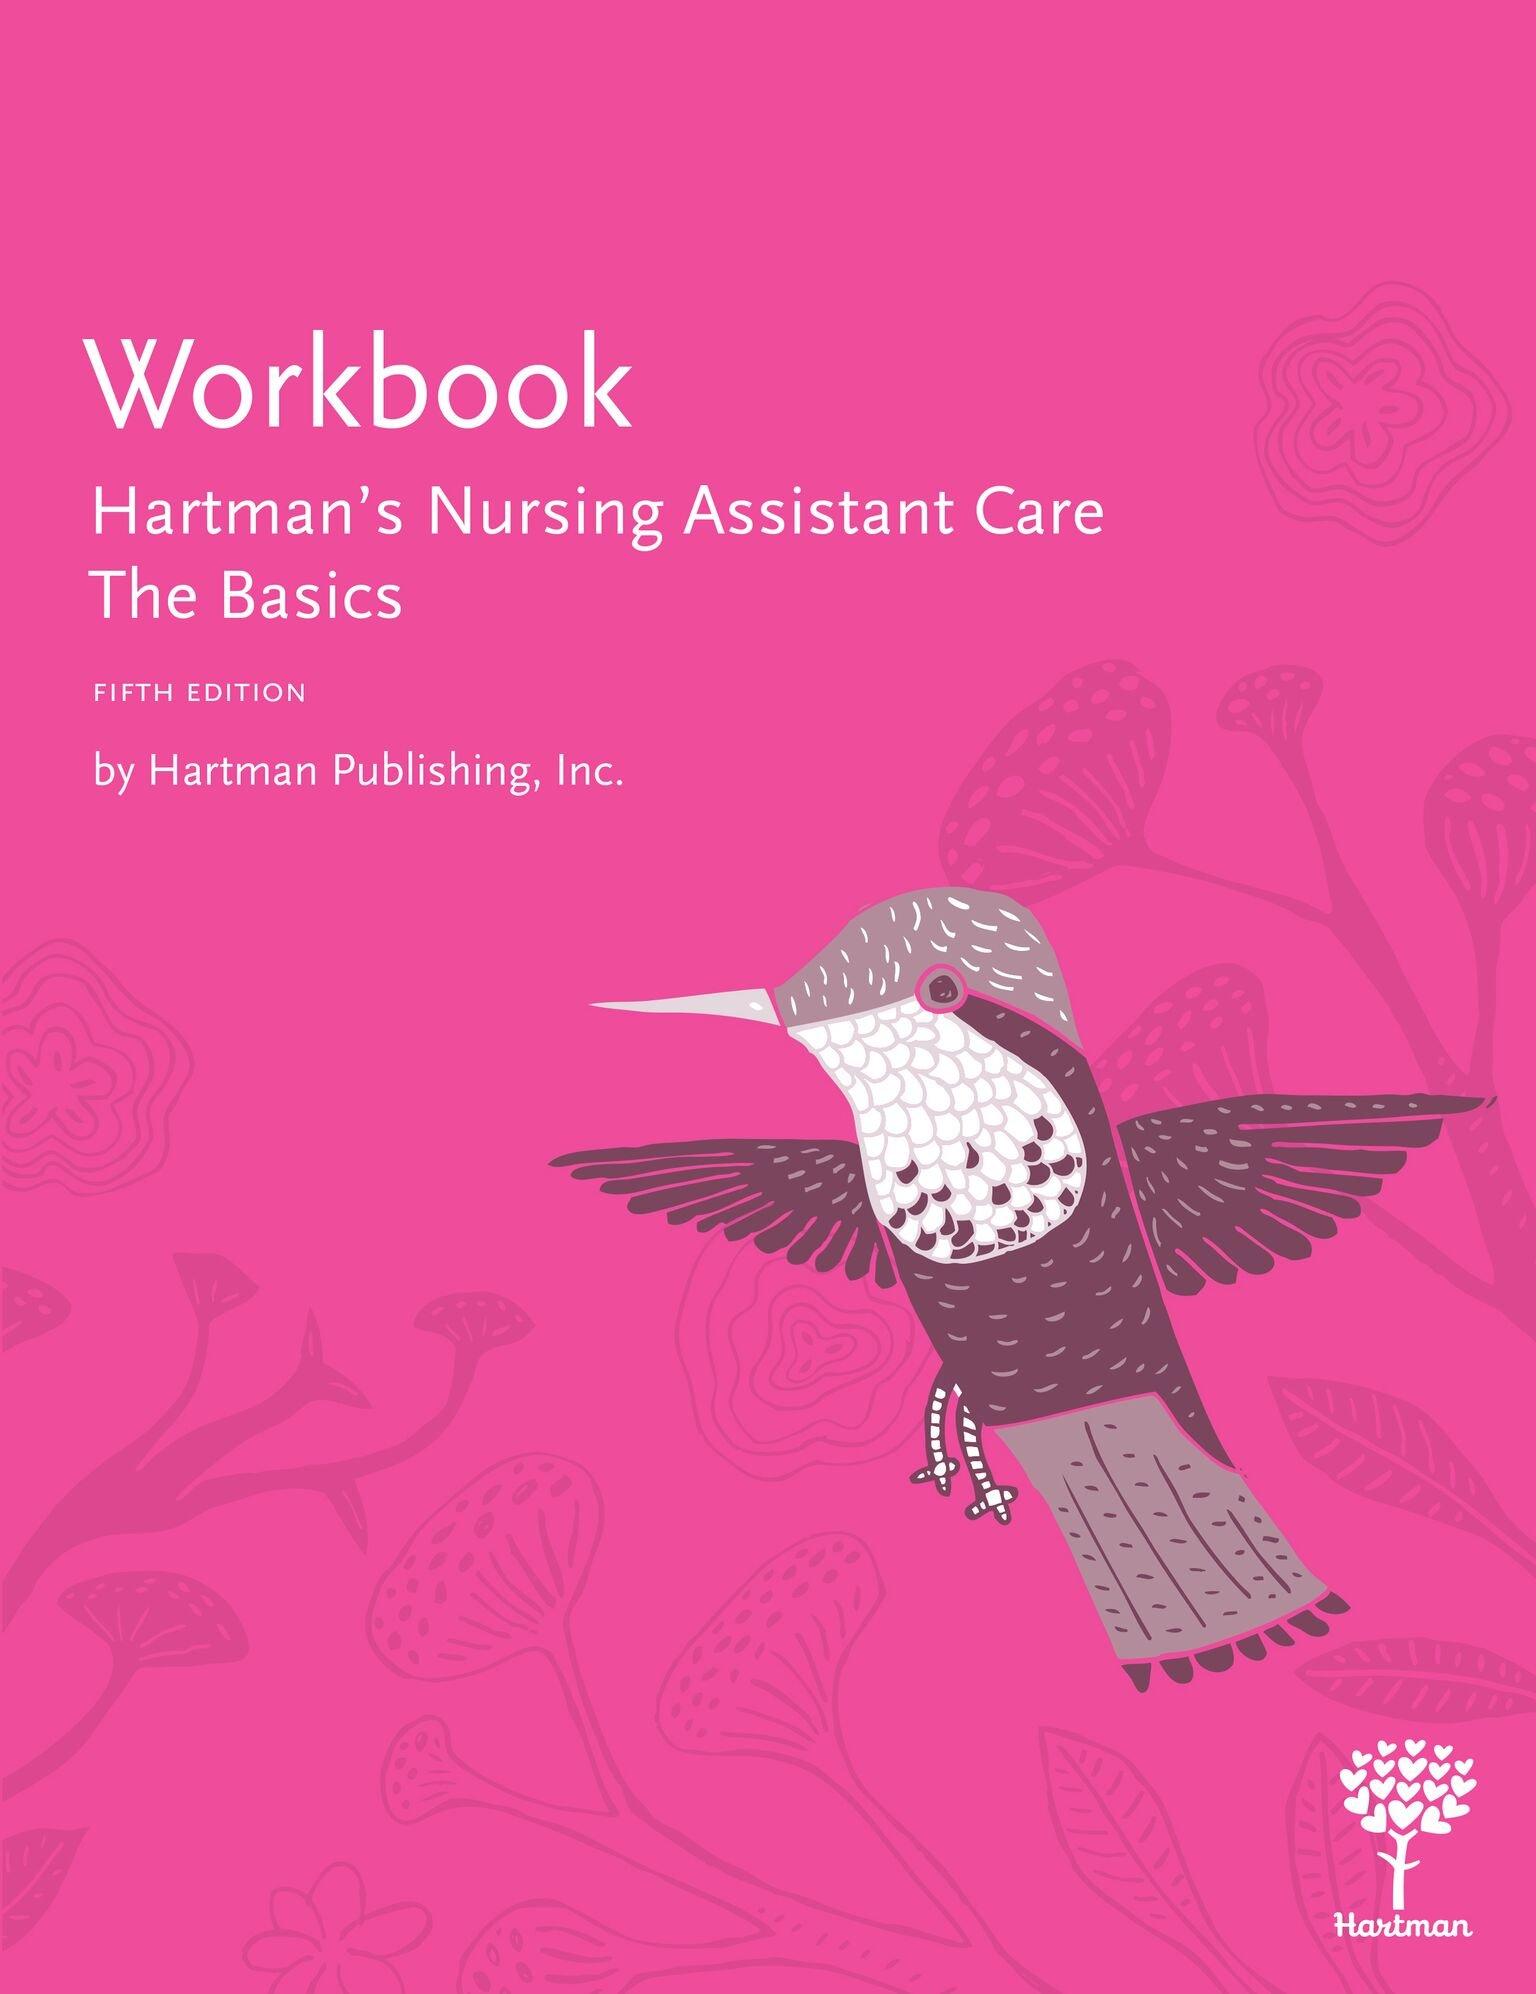 Workbook for Hartman's Nursing Assistant Care: The Basics, 5th Edition:  Hartman Publishing Inc.: 9781604251012: Amazon.com: Books